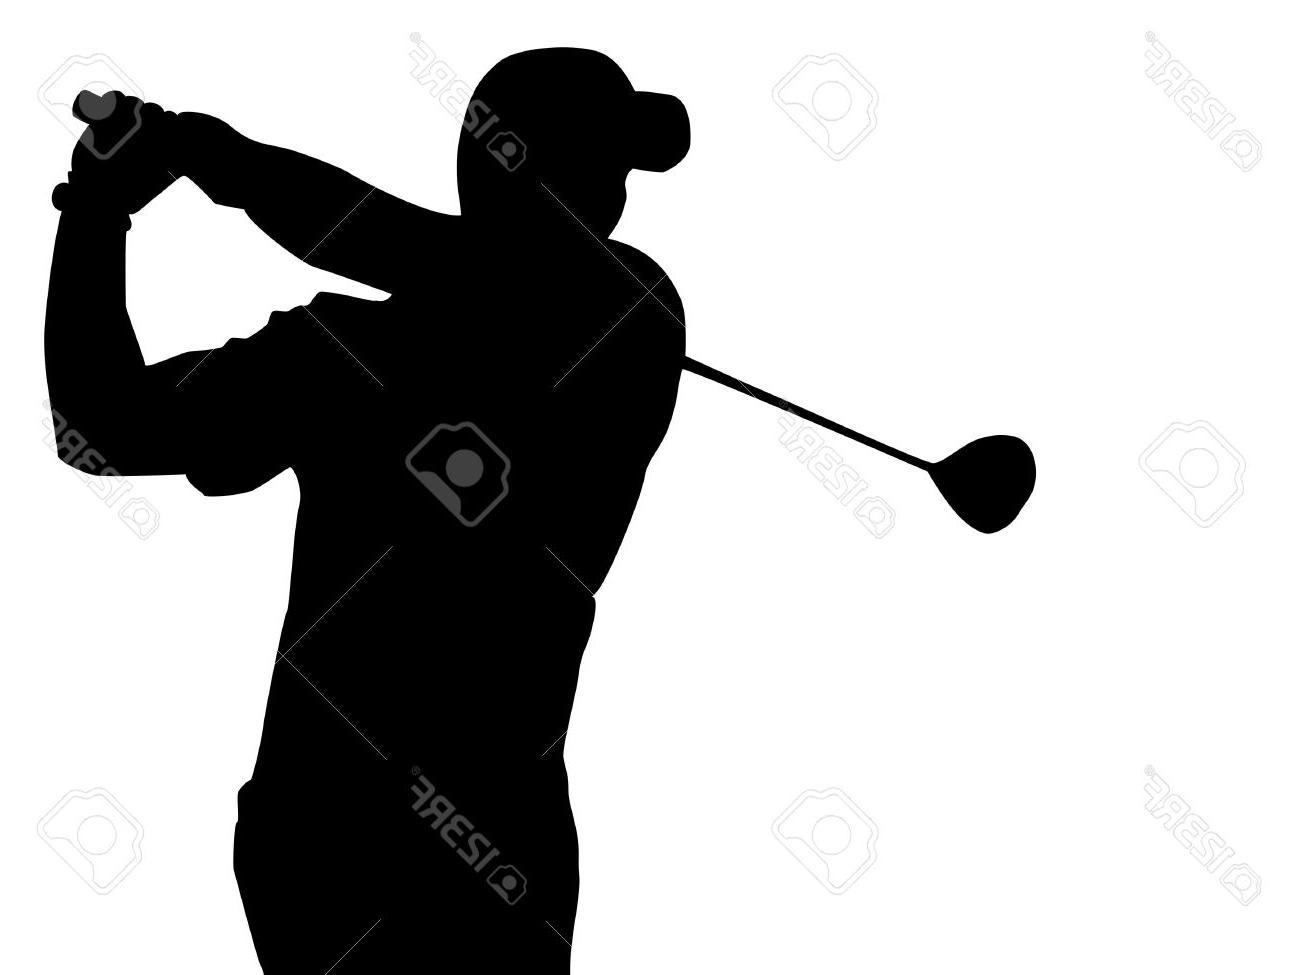 1300x975 Best 15 Epa Golfer Silhouette Stock Vector Golf Design